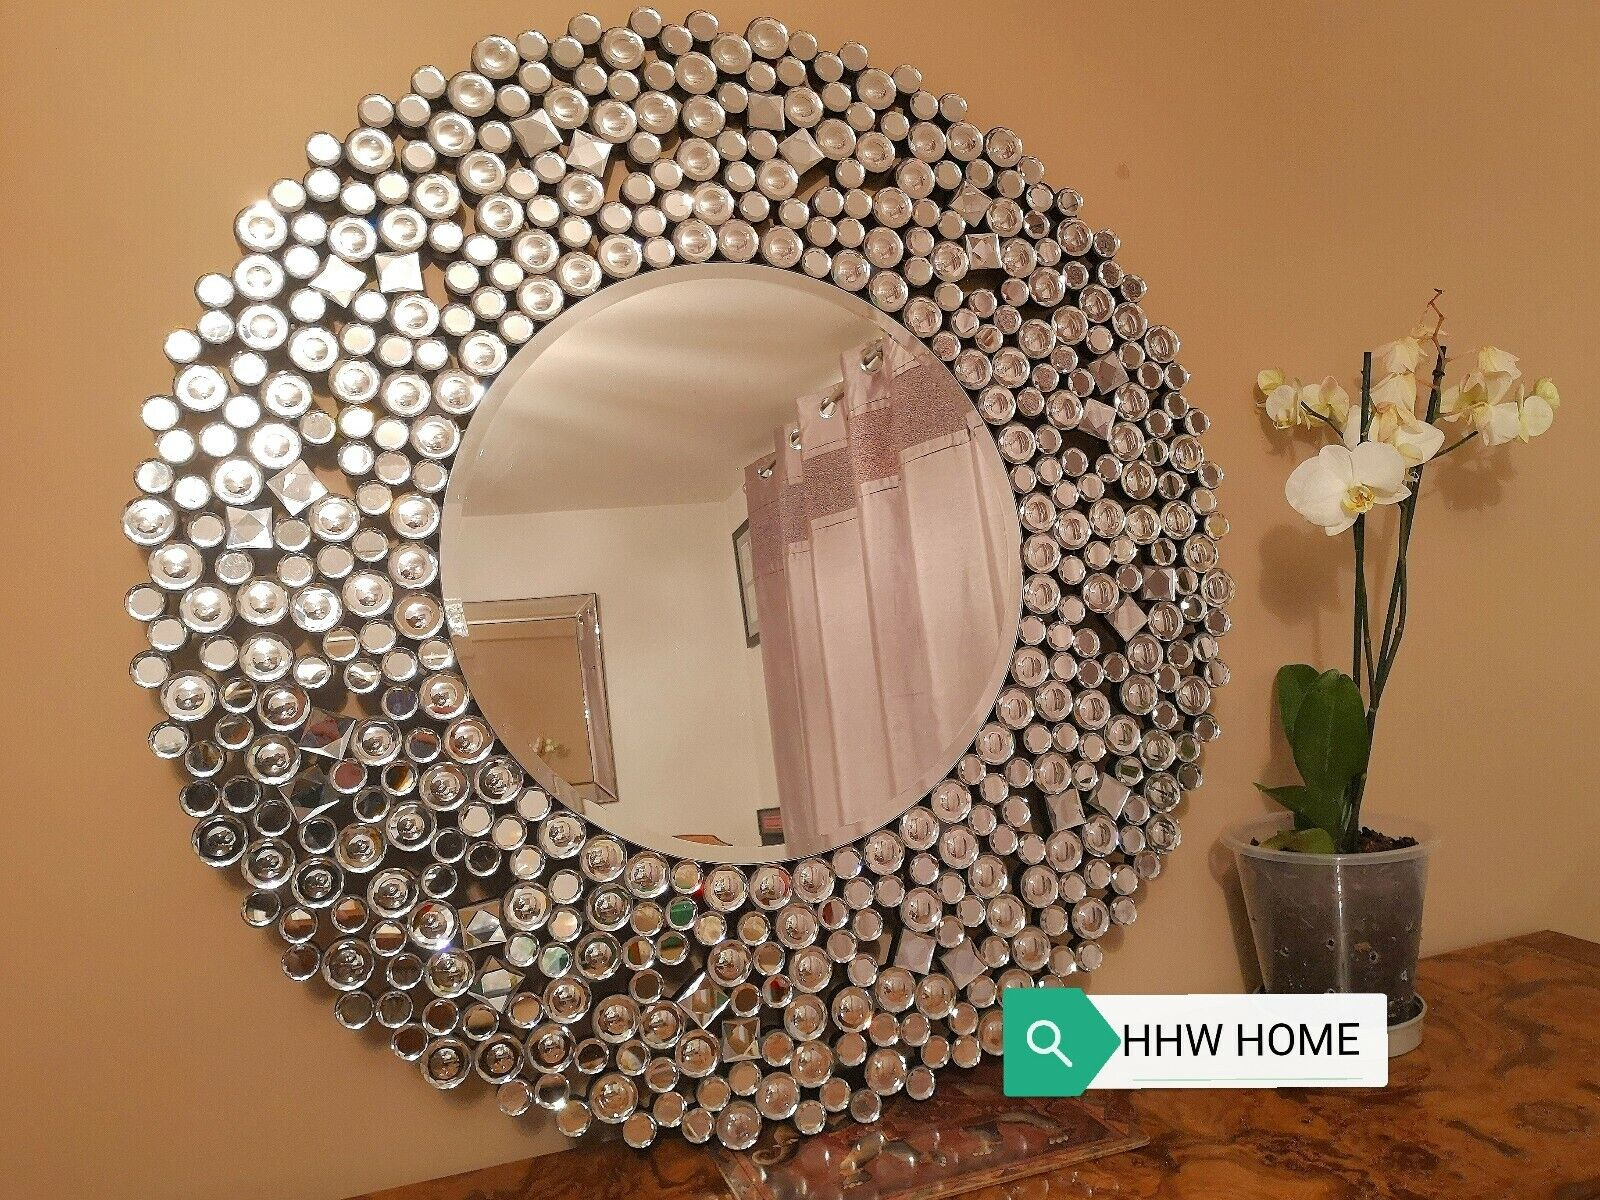 Home Decor Items Moroccan Large Silver Round Wall Mirror Art Deco Bathroom Mirrored Swirl Home Home Furniture Diy Ot Baieducotentin Fr